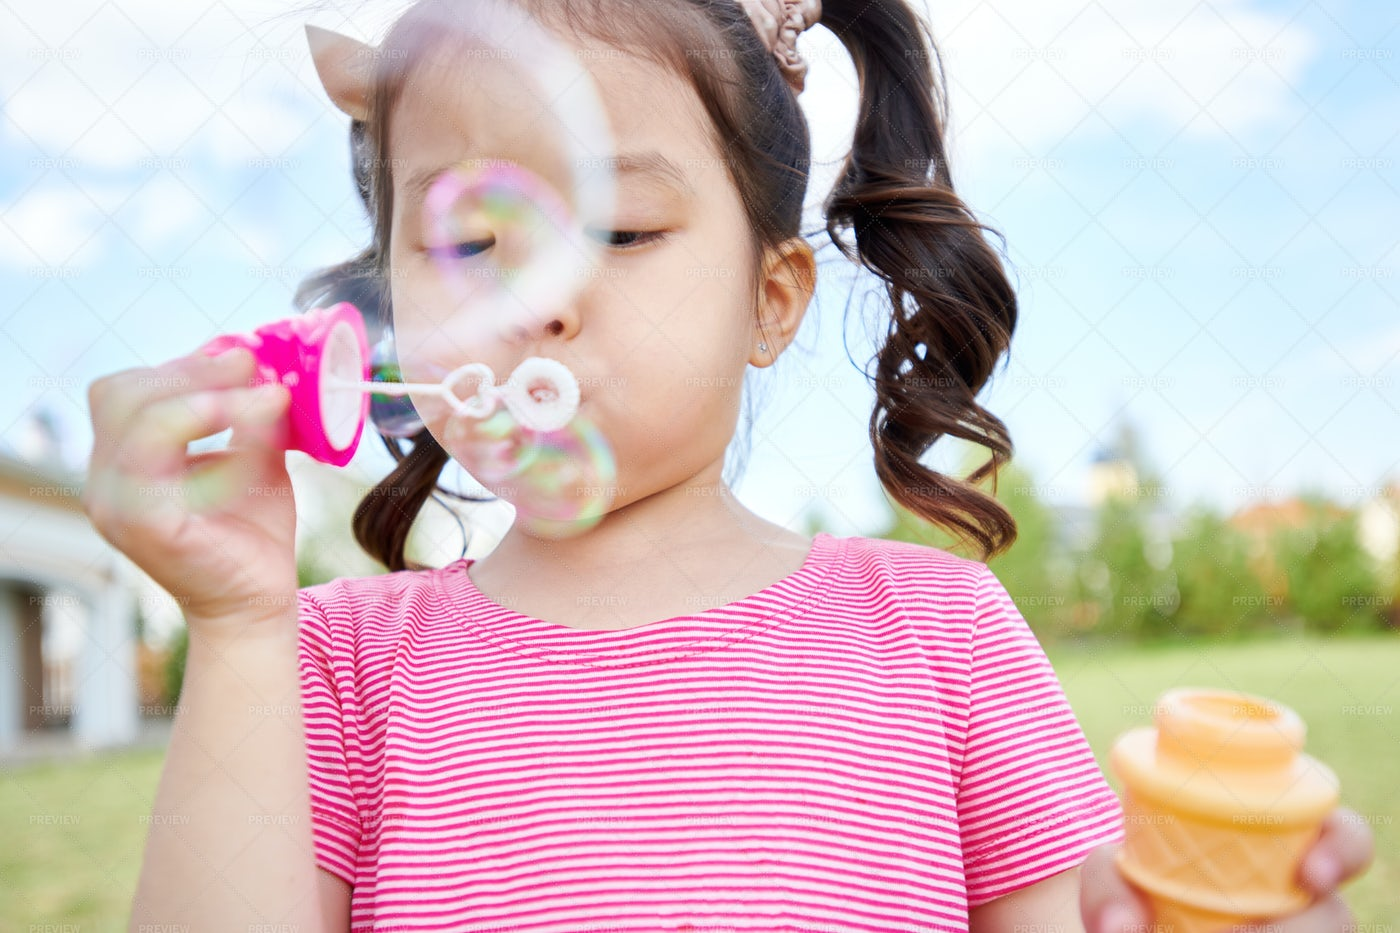 Cute Asian Girl Blowing Bubbles...: Stock Photos